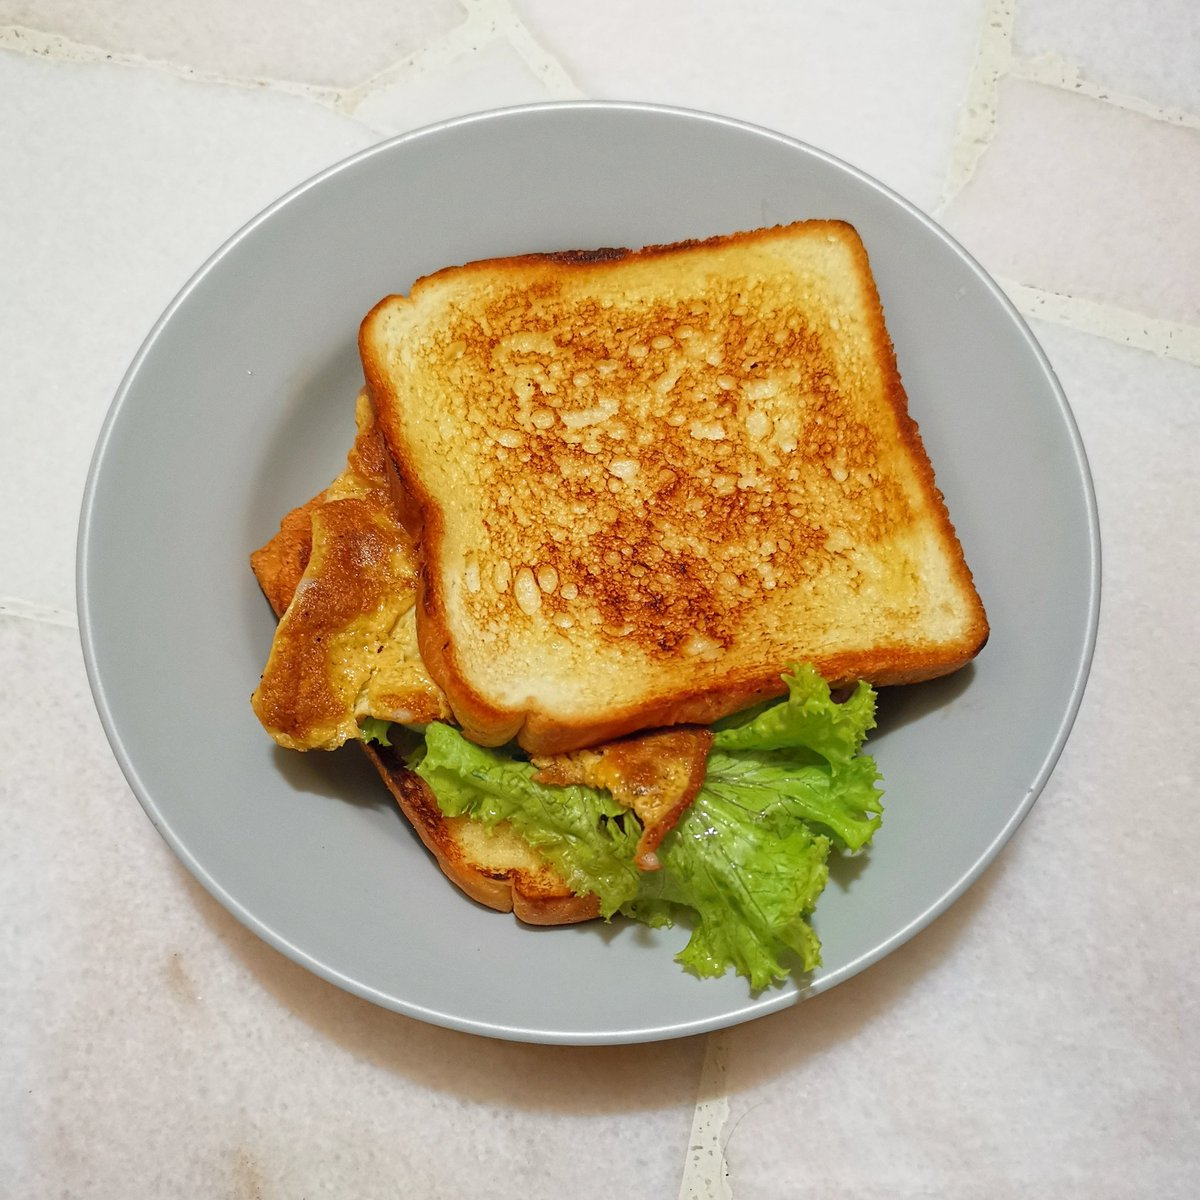 Friday's breakfast 🥪🍳☕ #FridayVibes #breakfast #toast #desayuno #scrambledeggs  #sandwich #organic #healthy #fitness #lifestyle #coffee #tea #homemade #StayAtHome #eatathome #abendessen #早餐 #蛋治 #三文治 #料理写真 #おいしい #저녁식사 https://t.co/4pu4q4Zd3y